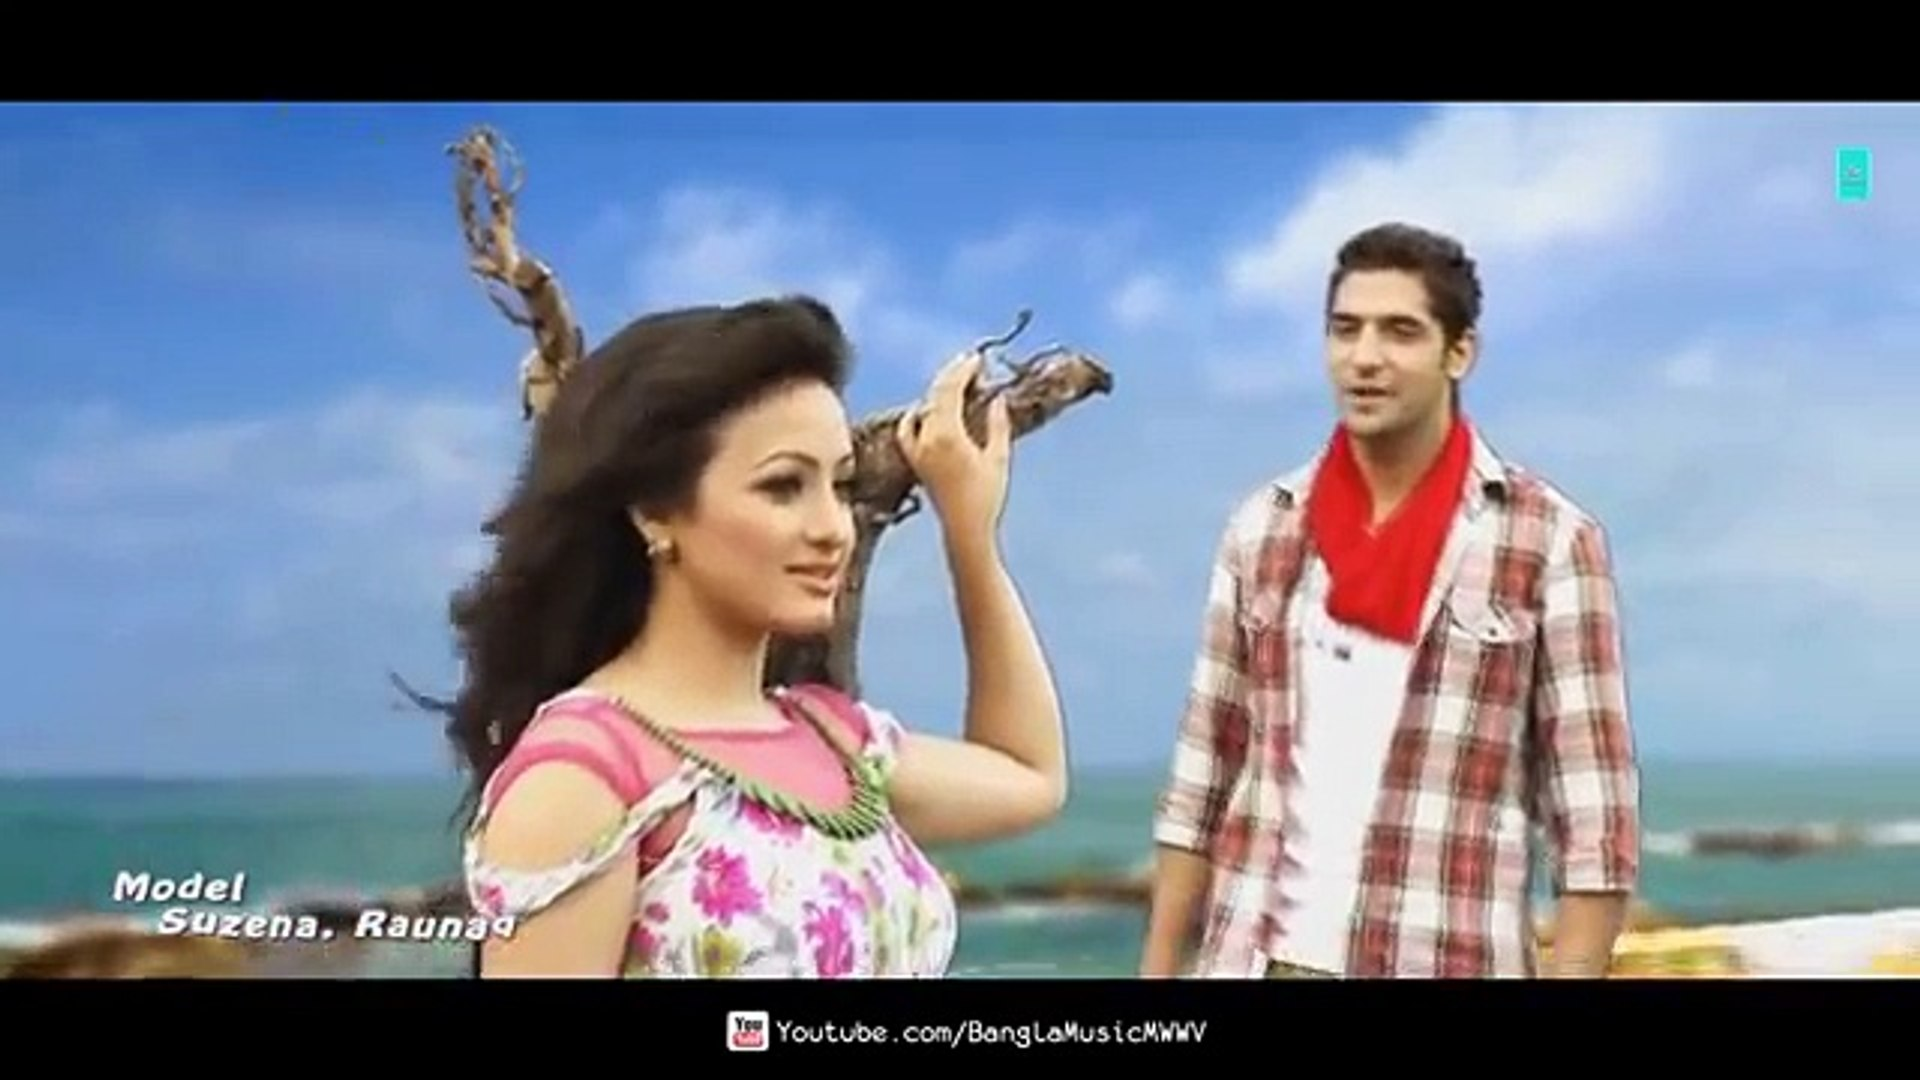 Manena Mon Bangla Music Video Bangla Gaan Bangladesh Song Bengali